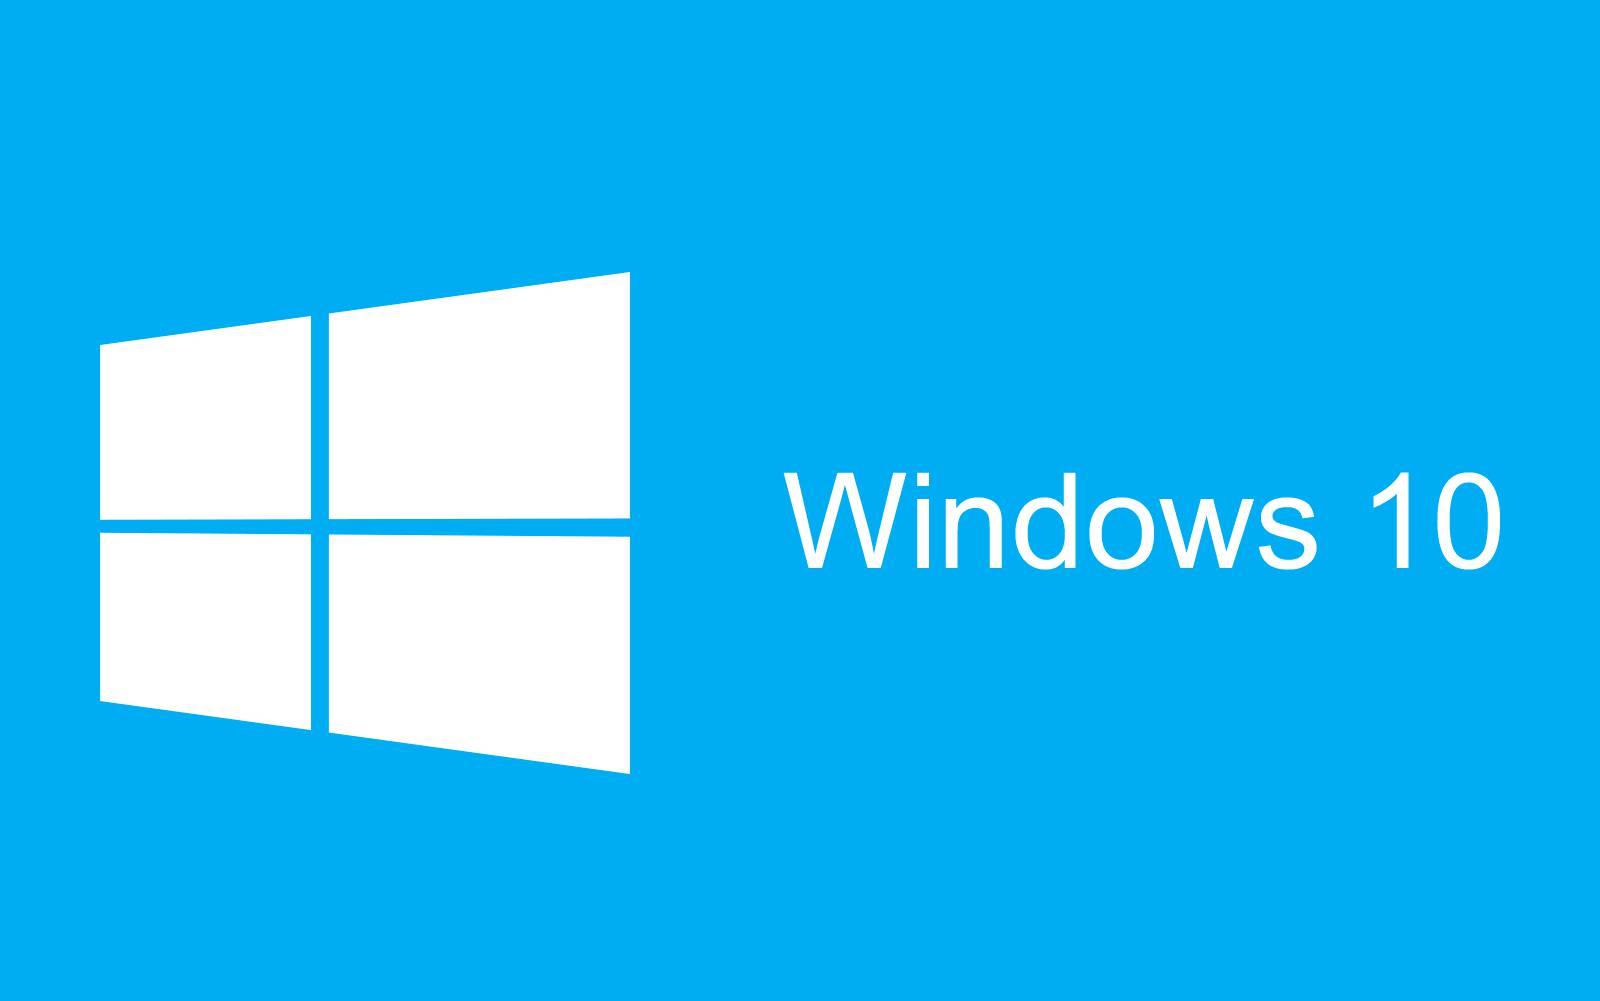 Windows 10 your phone